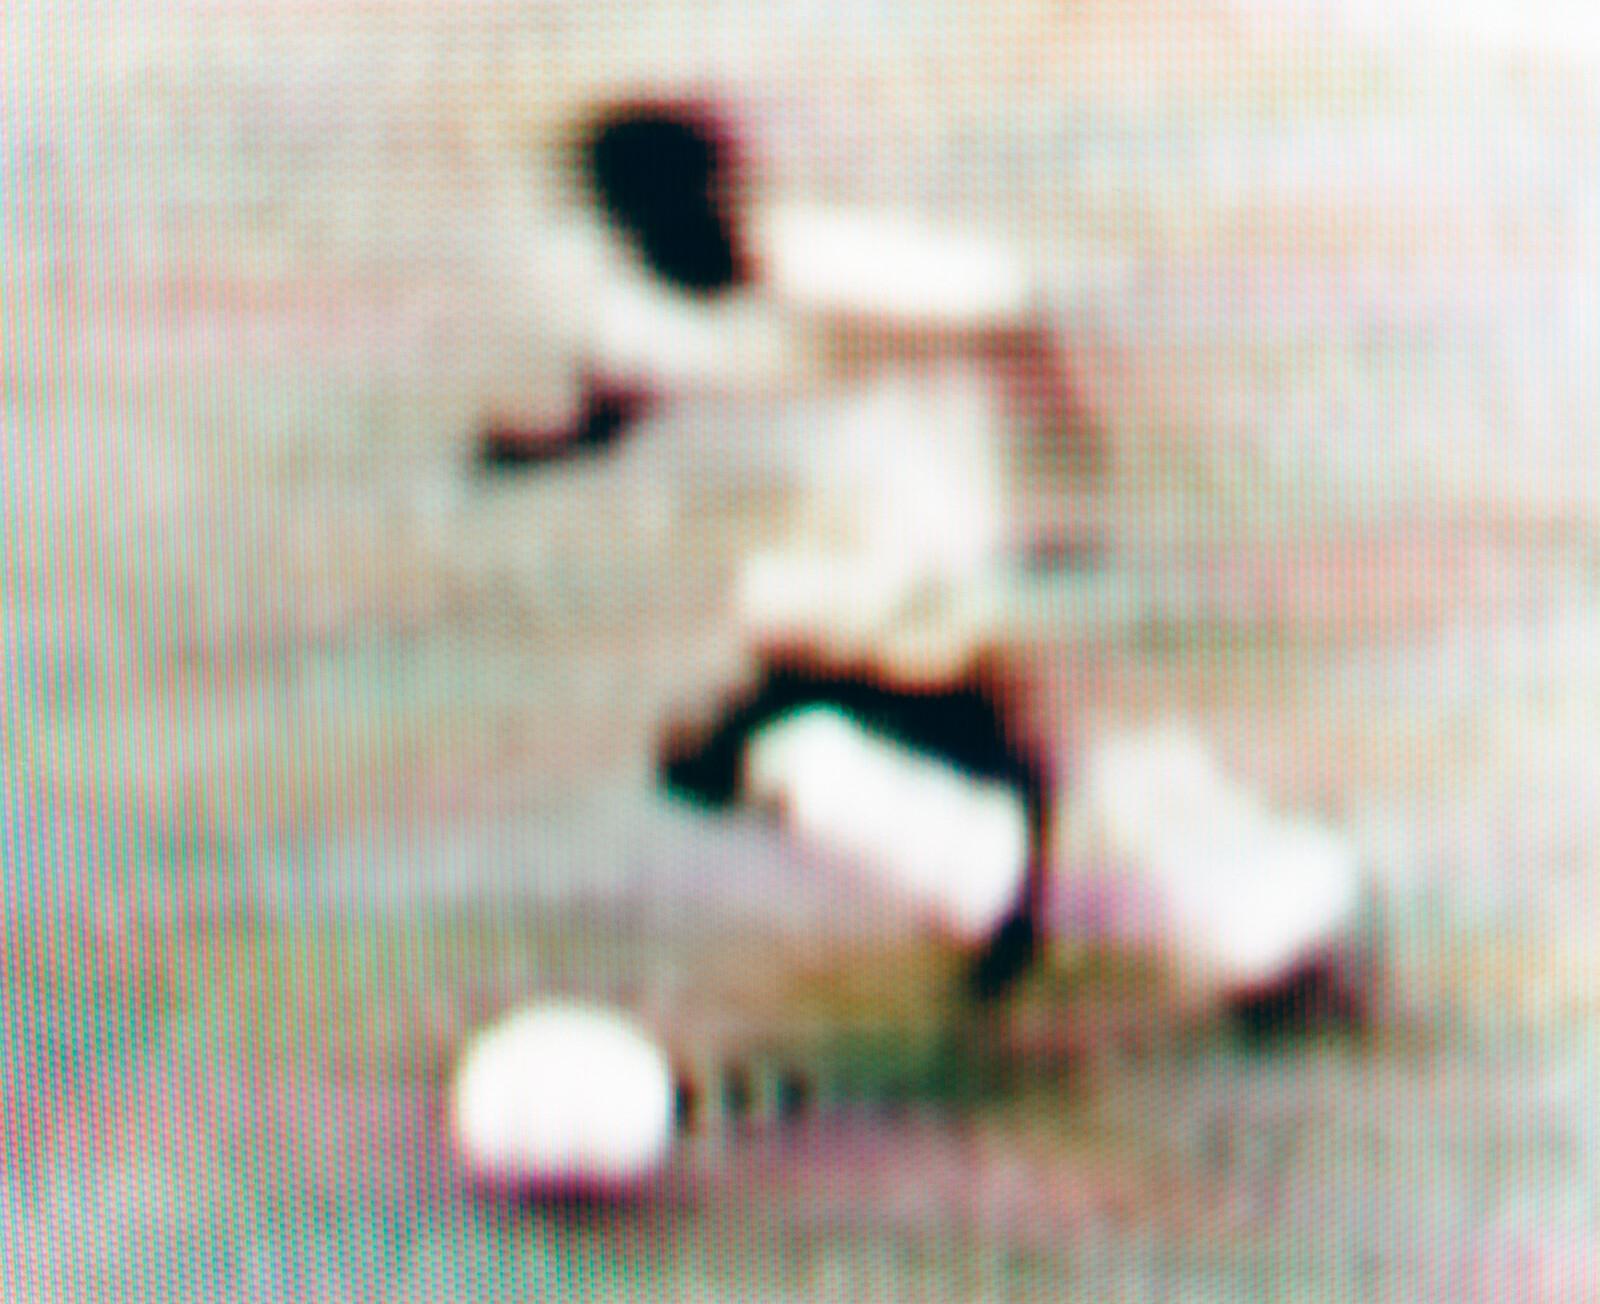 Pele v Bulgaria Brazil v Bulgaria, 2-0 (Group stage) 12.06.1966 Goodison Park, Liverpool, England - Robert Davies